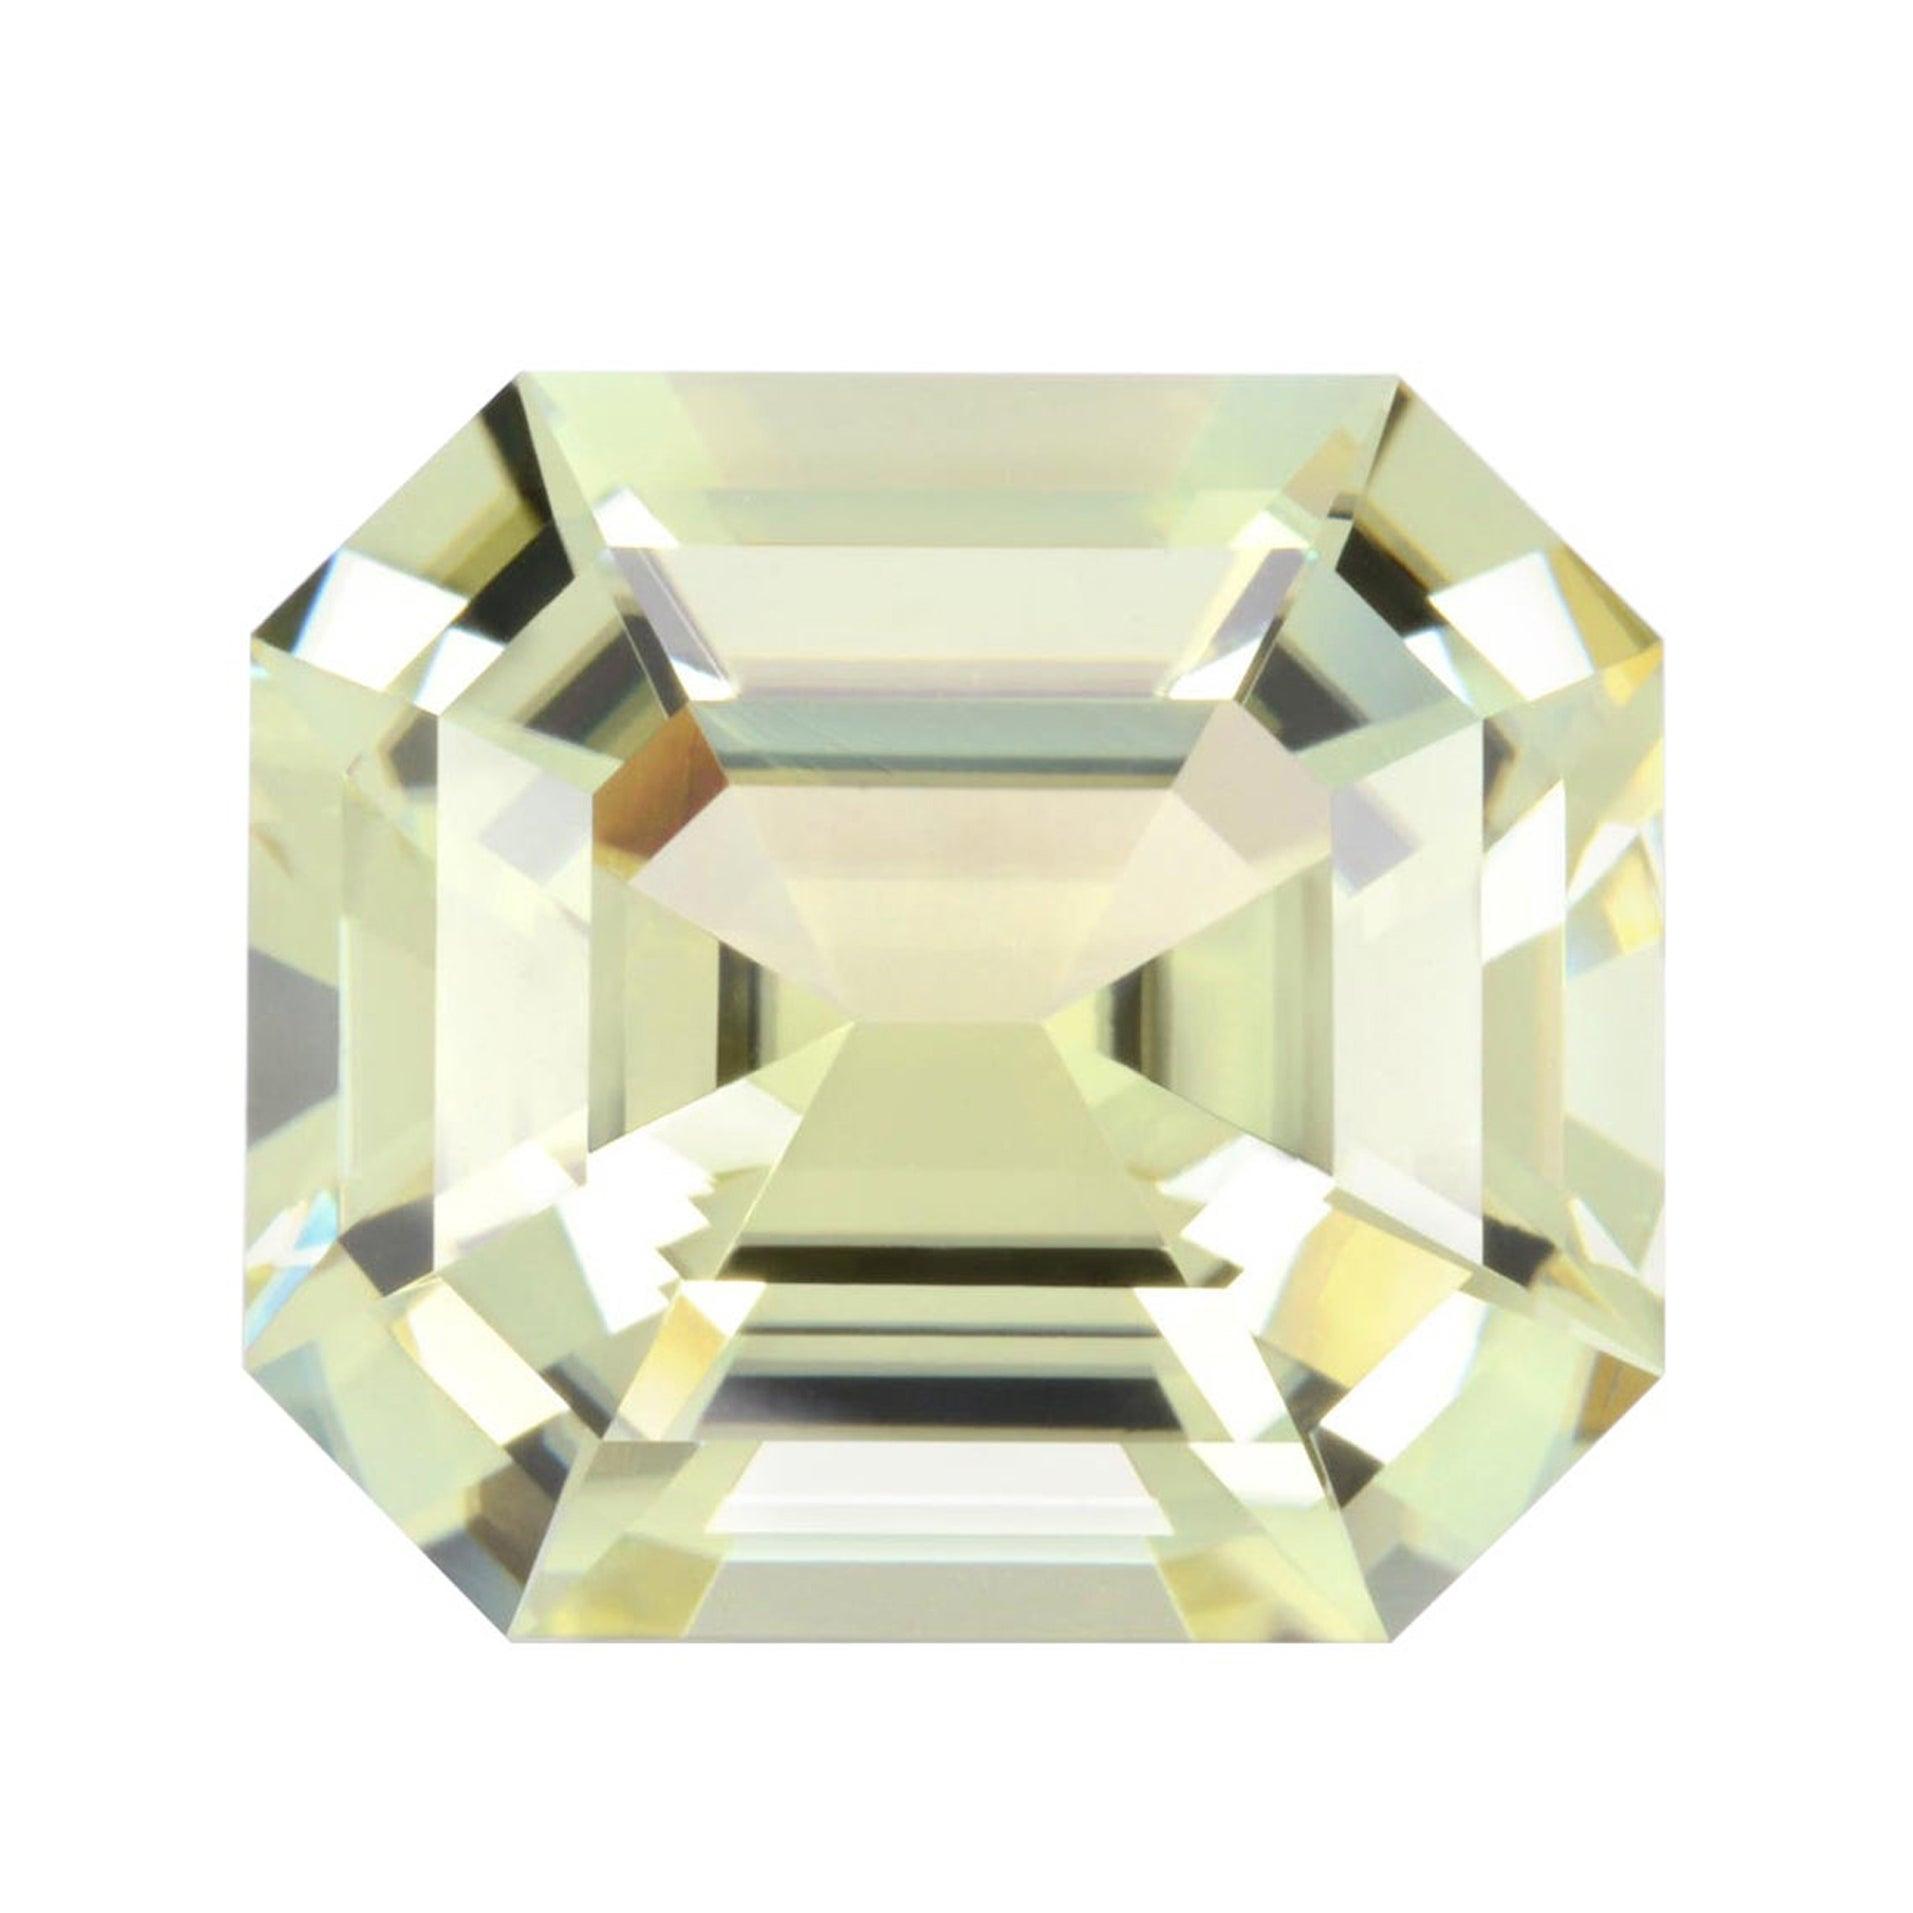 Greenish Yellow Tourmaline Ring Gem 17.54 Carat Unset Emerald Cut Loose Gemstone